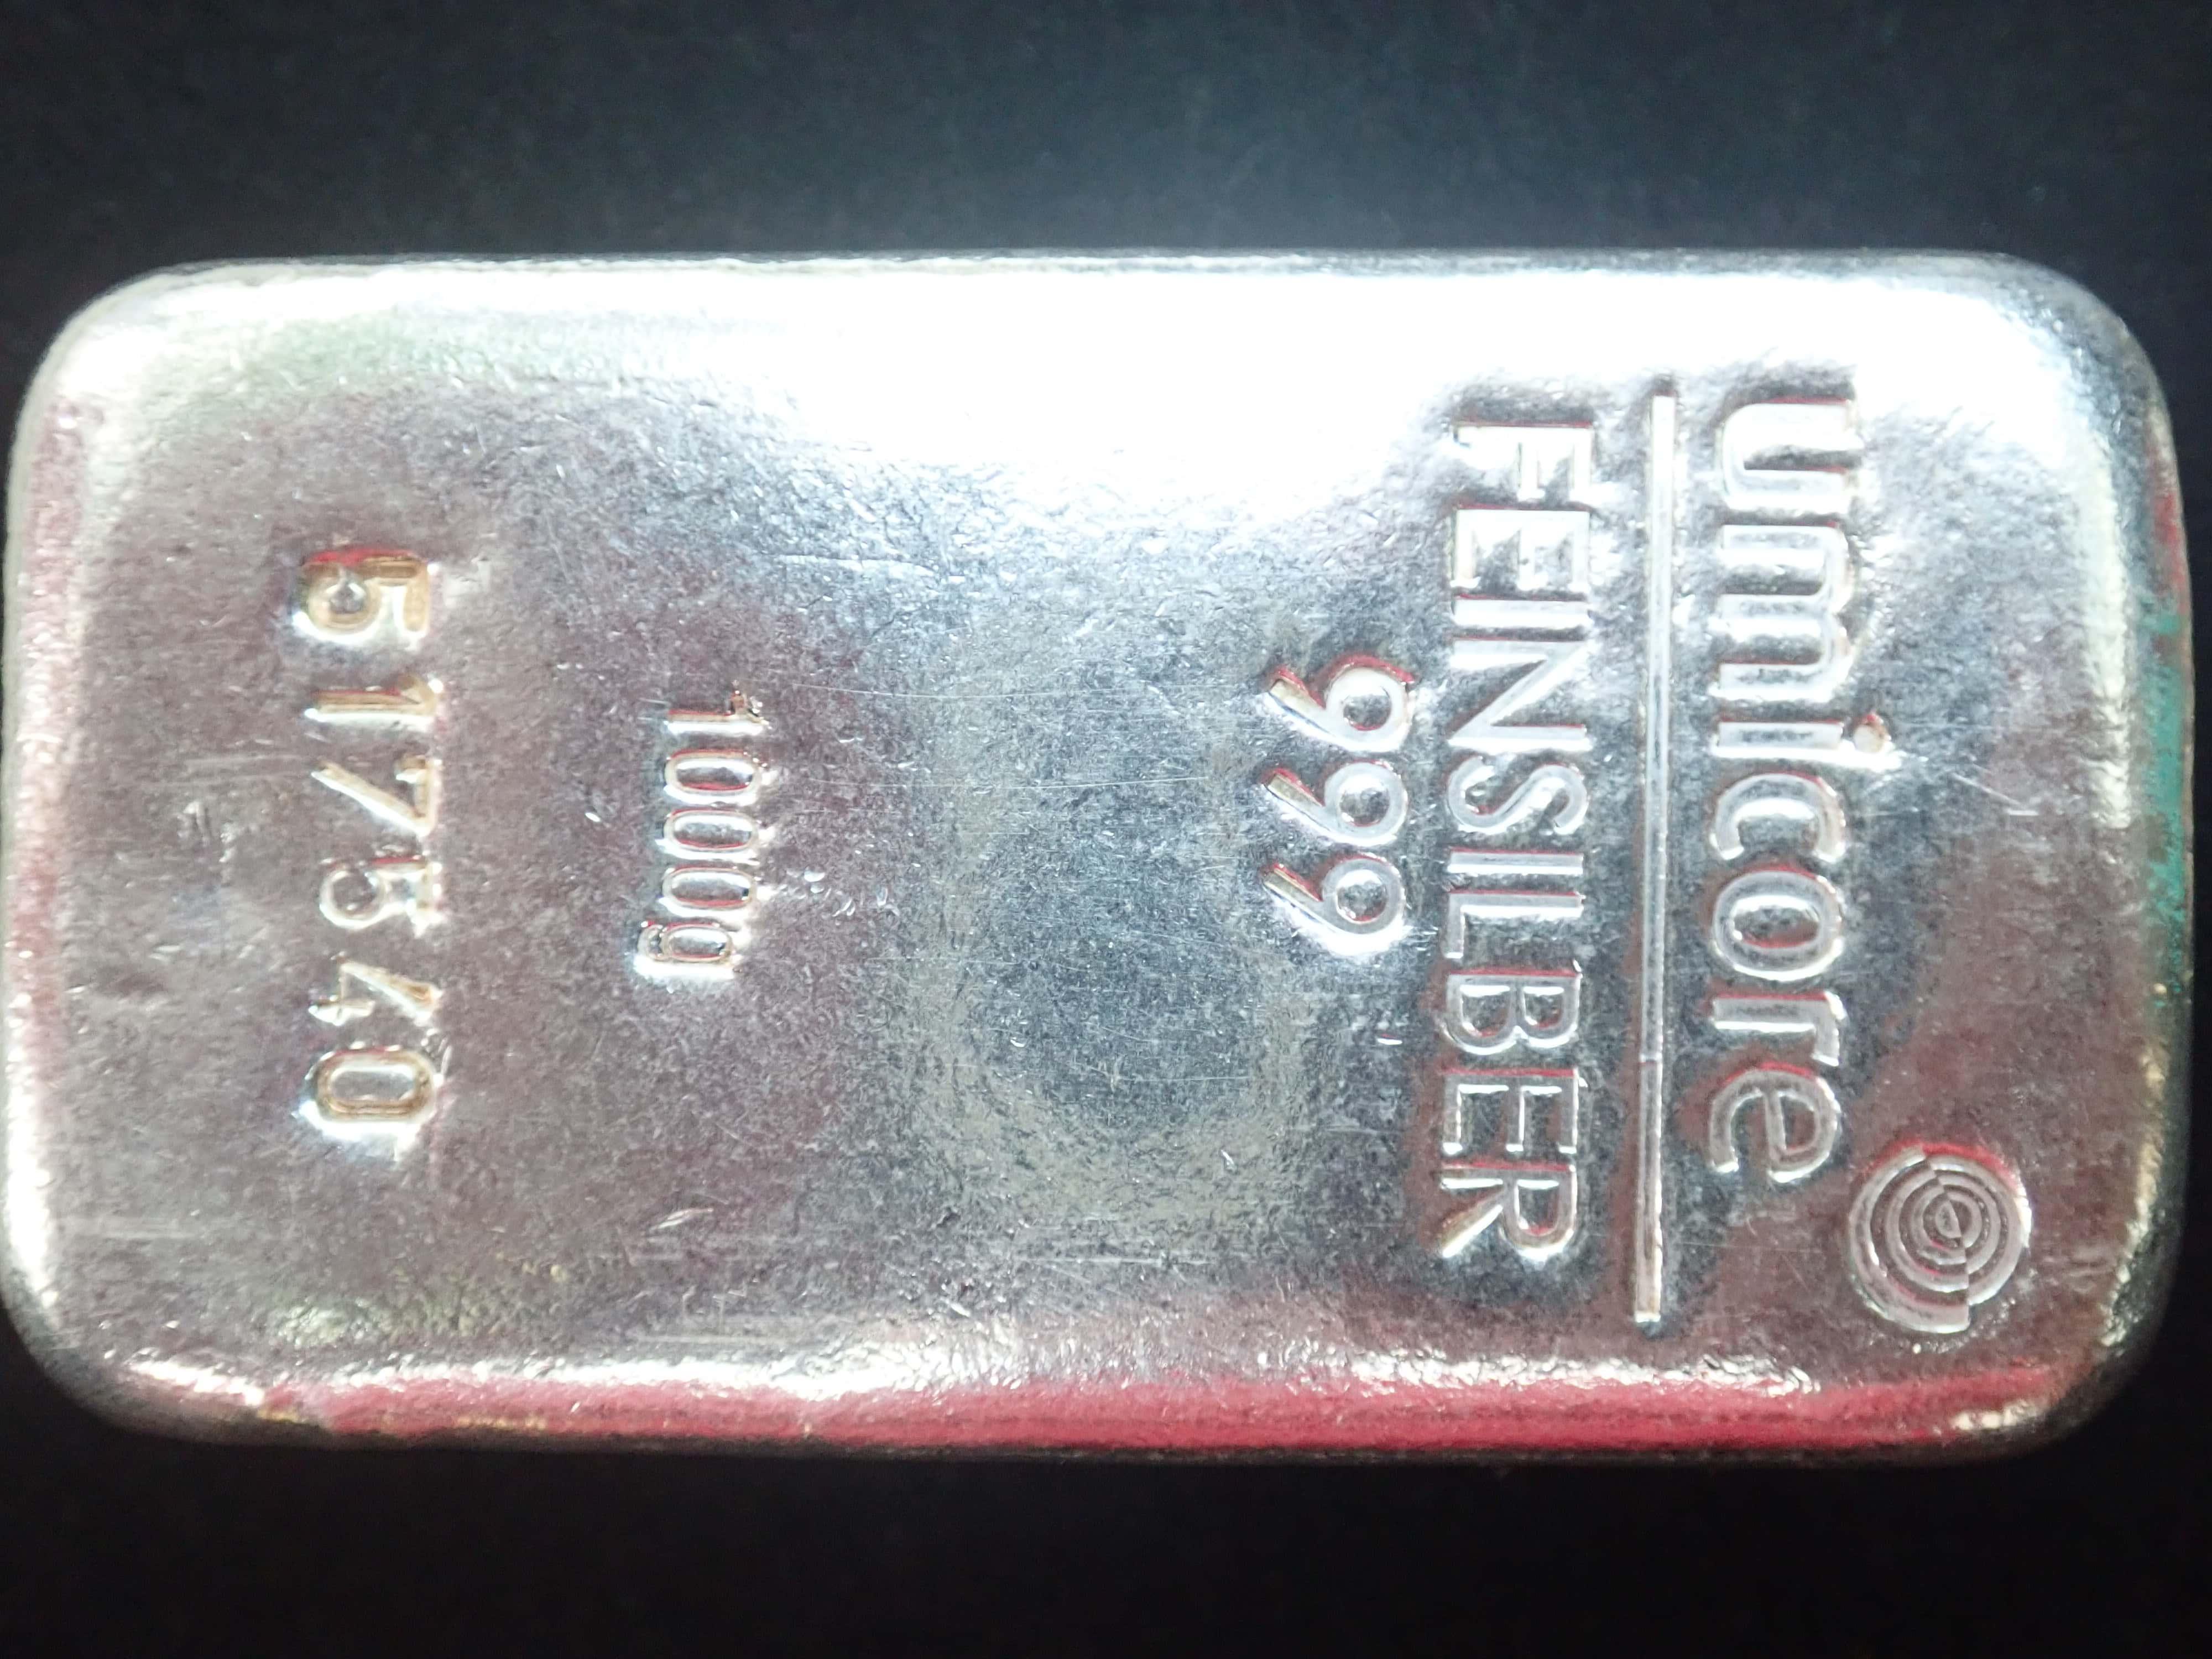 AZZ00596 - 1000 Grams 999.0 Fine Silver Umicore 1kg Silver Bullion Bar